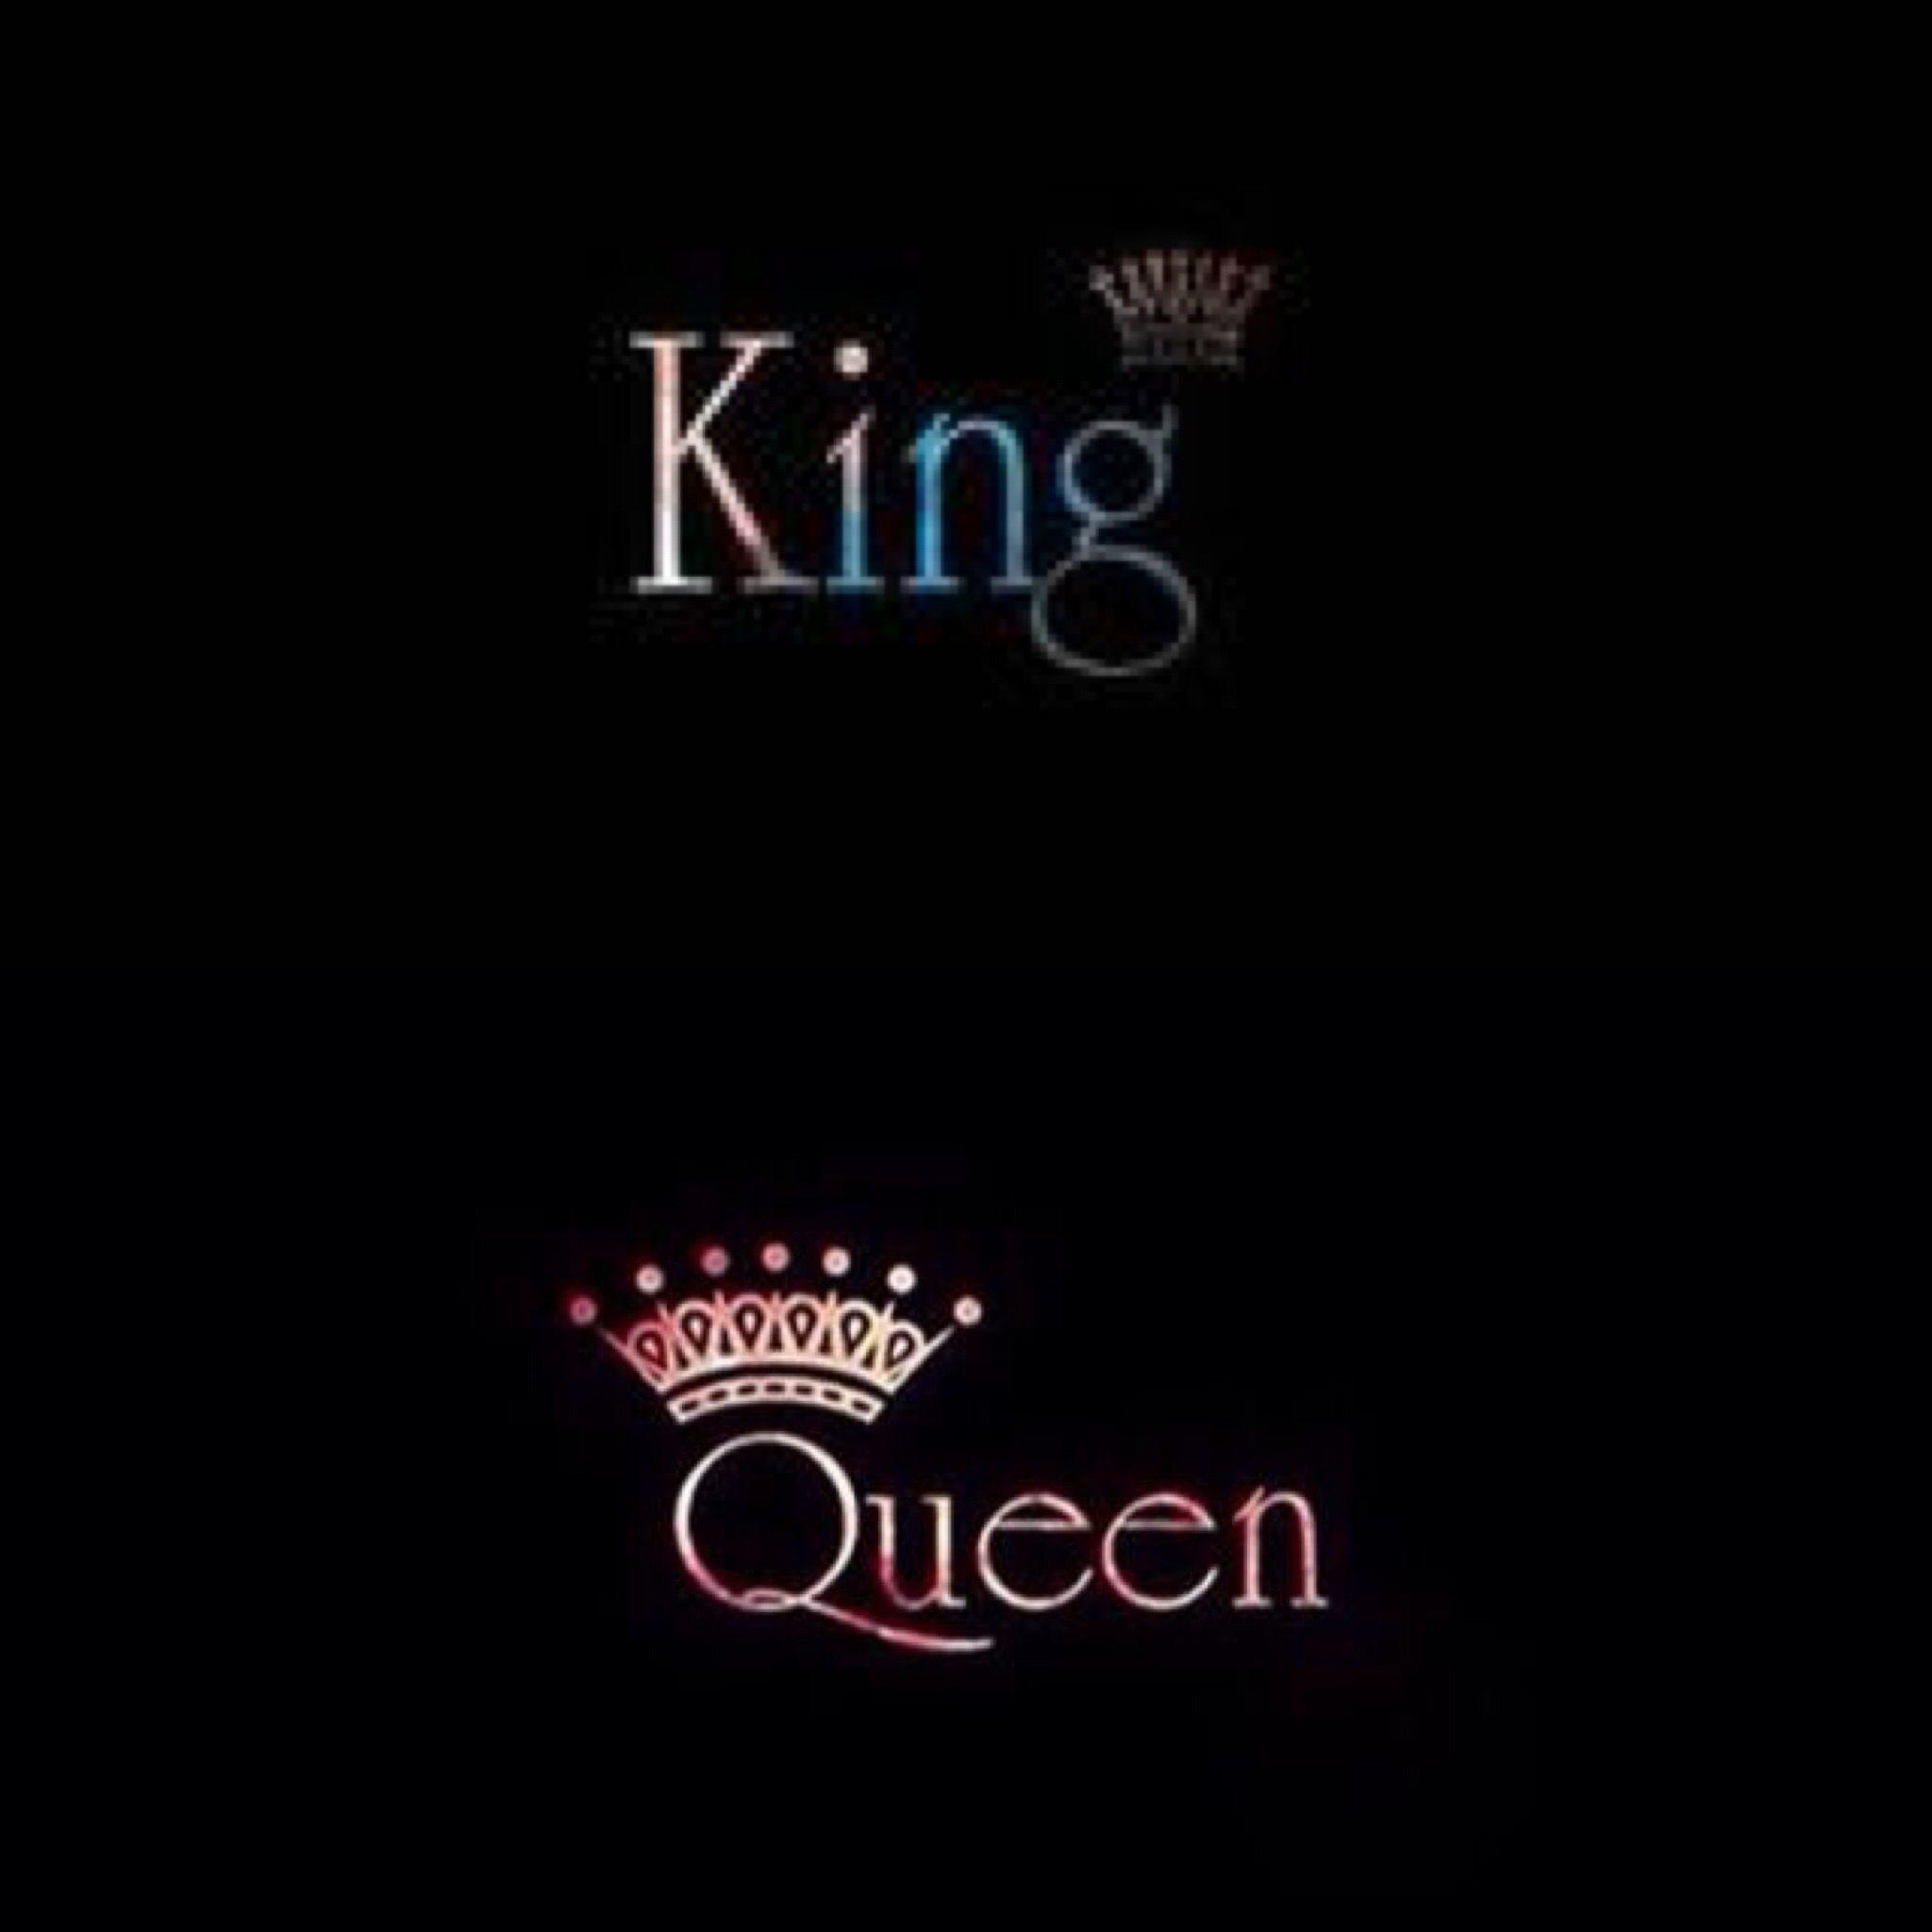 He S My King I M His Queen Queens Wallpaper King And Queen Crowns Name Wallpaper